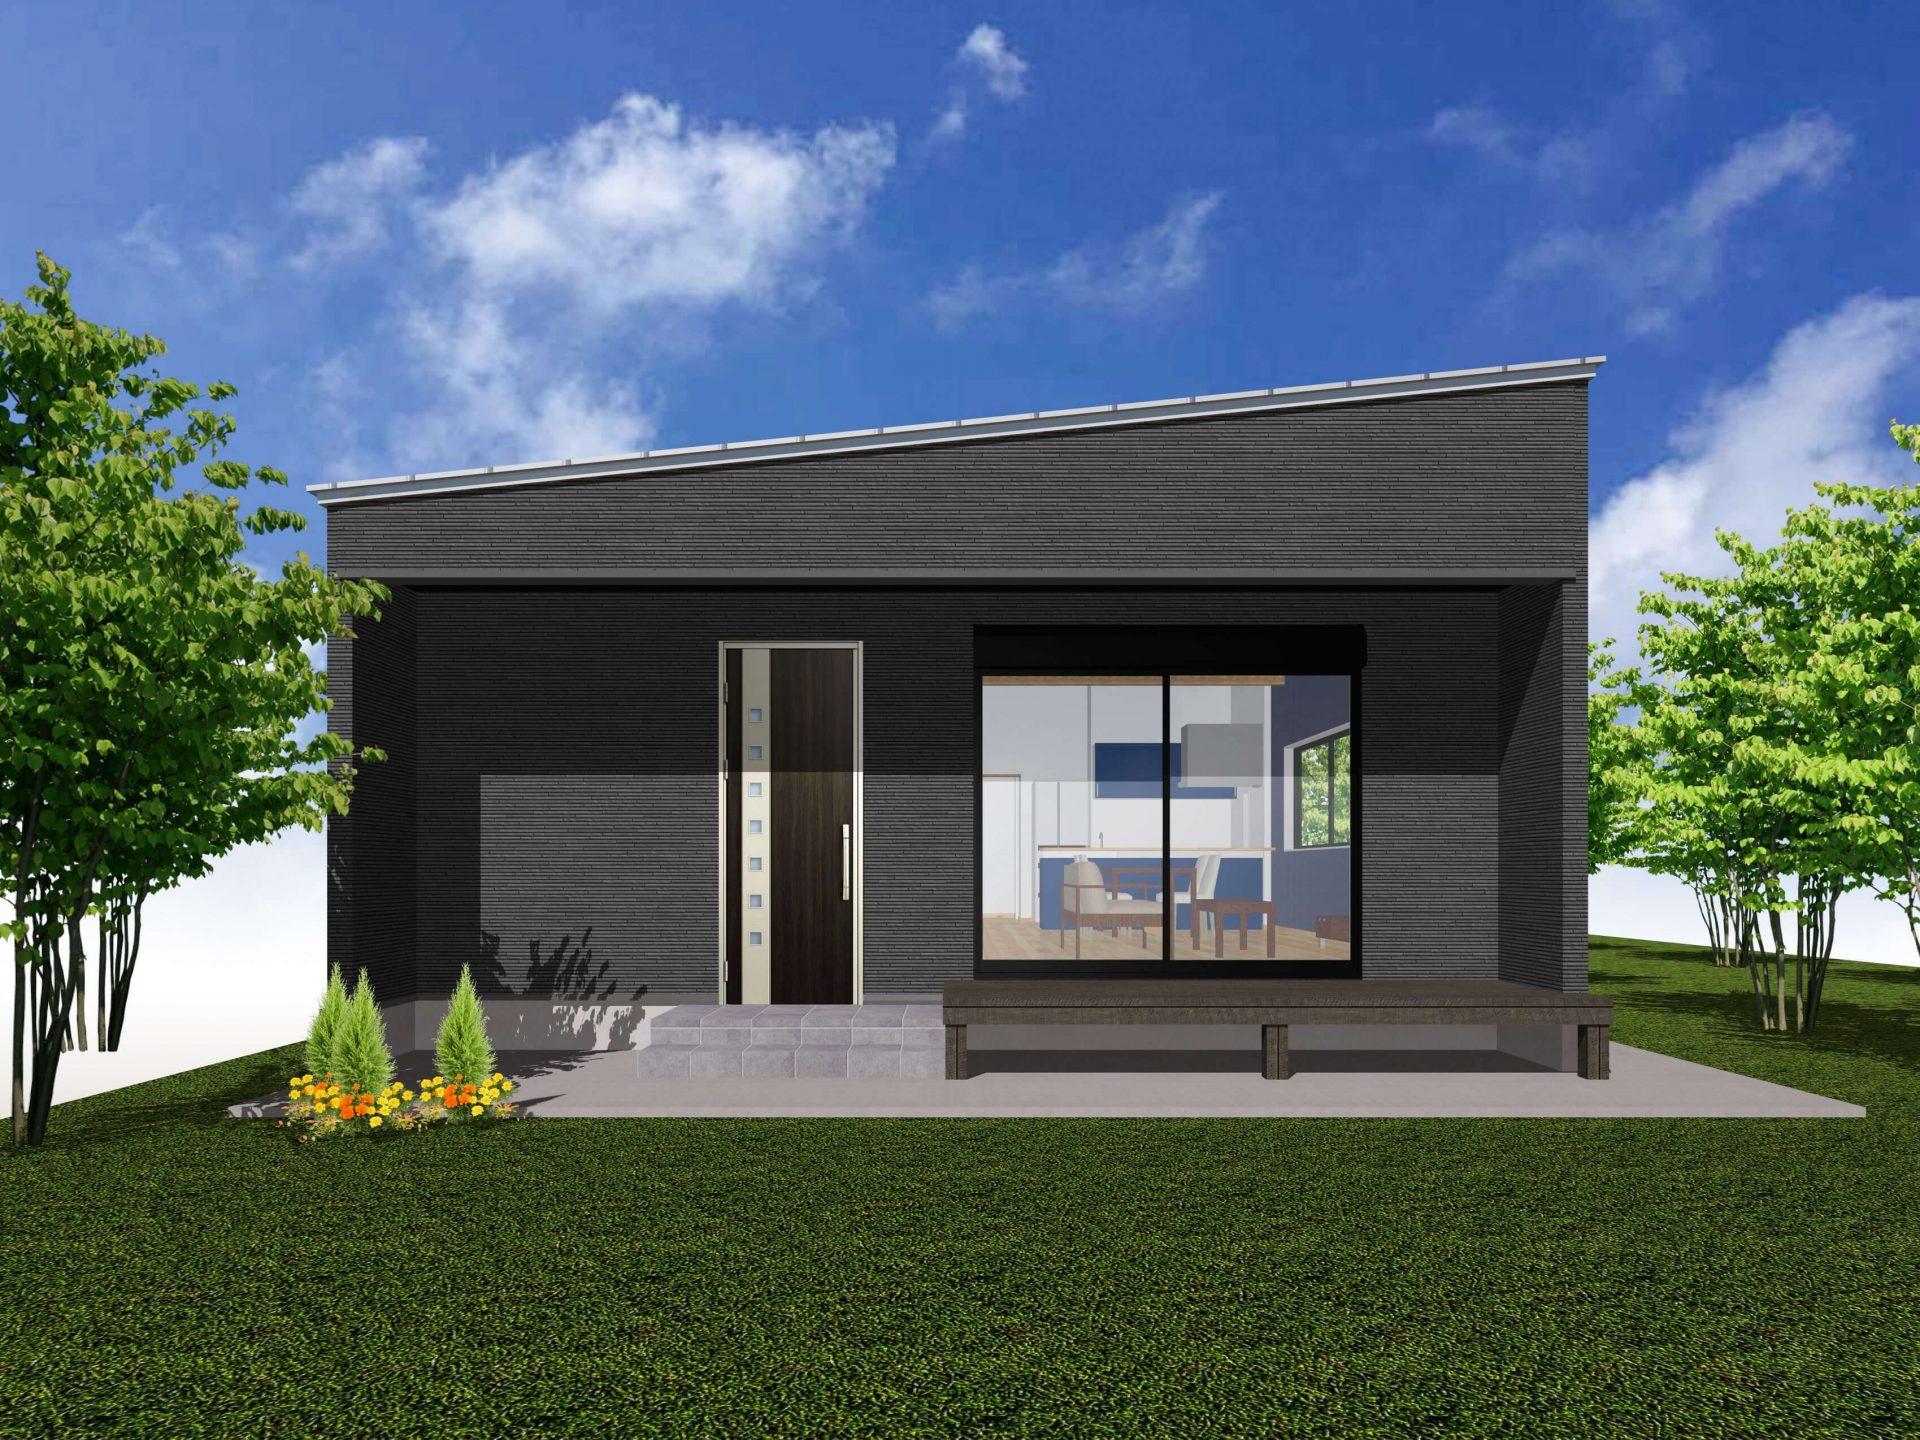 行方市の平屋の完成見学会20210327